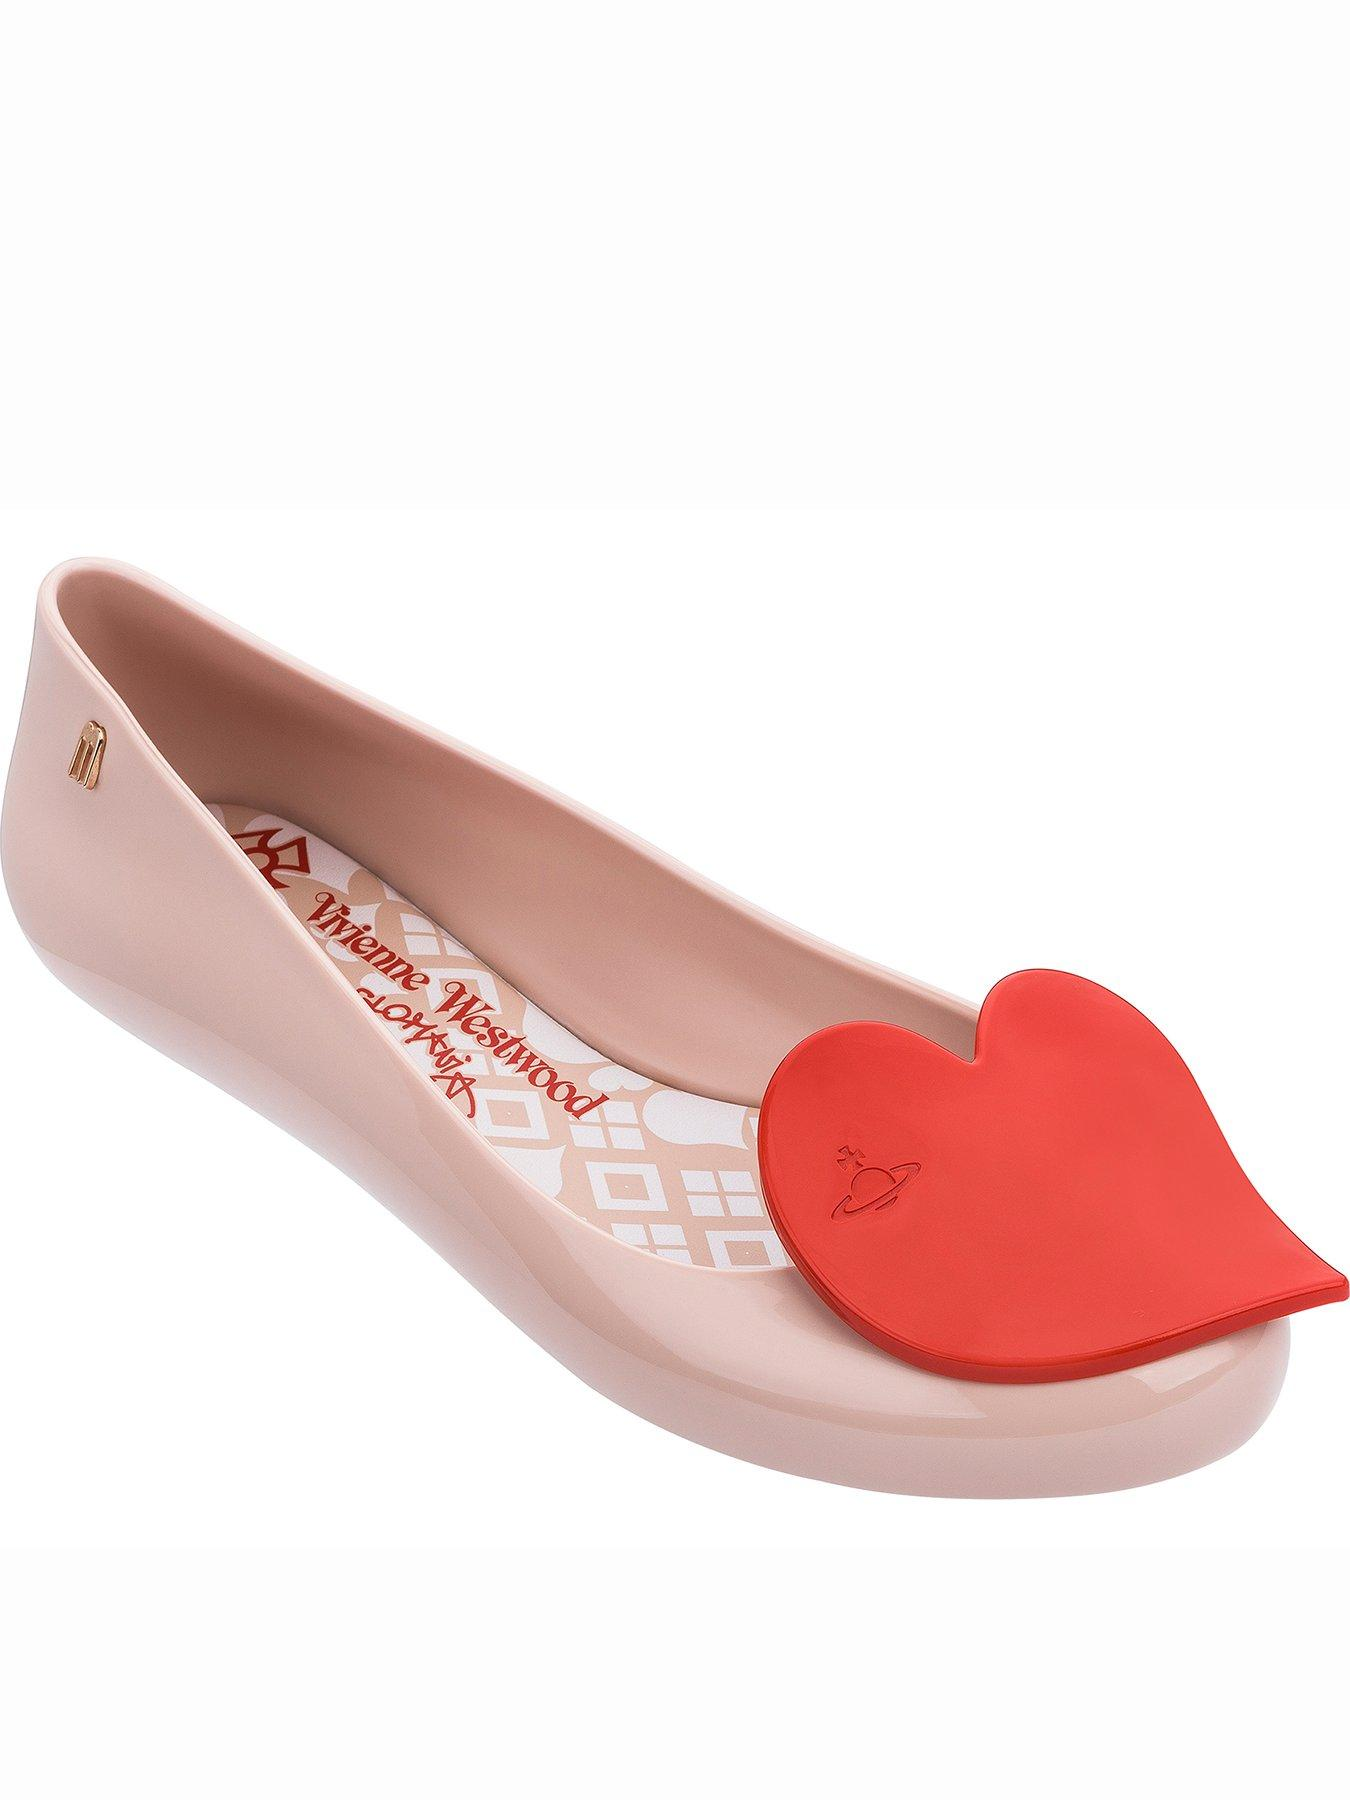 MELLOW SHOP Modern Dance Shoes Closed Toe Sandals Indoor Dancing Shoes Women Girls Ladies